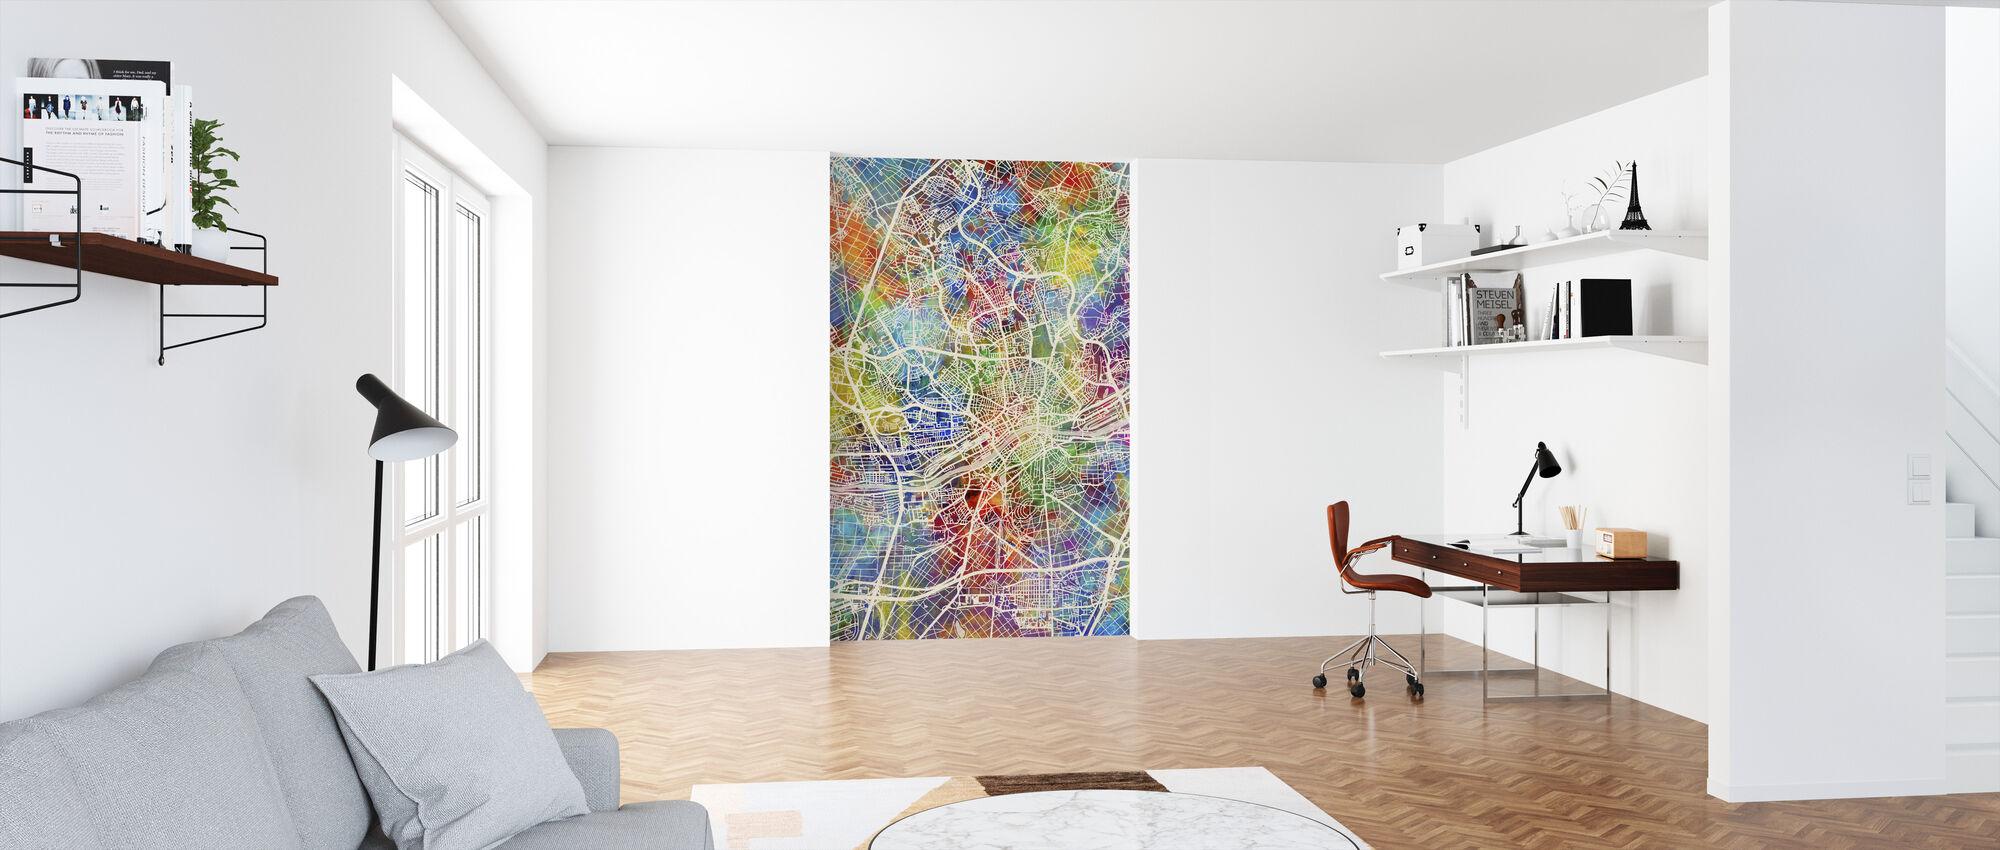 Frankfurt Germany City Map - Wallpaper - Office